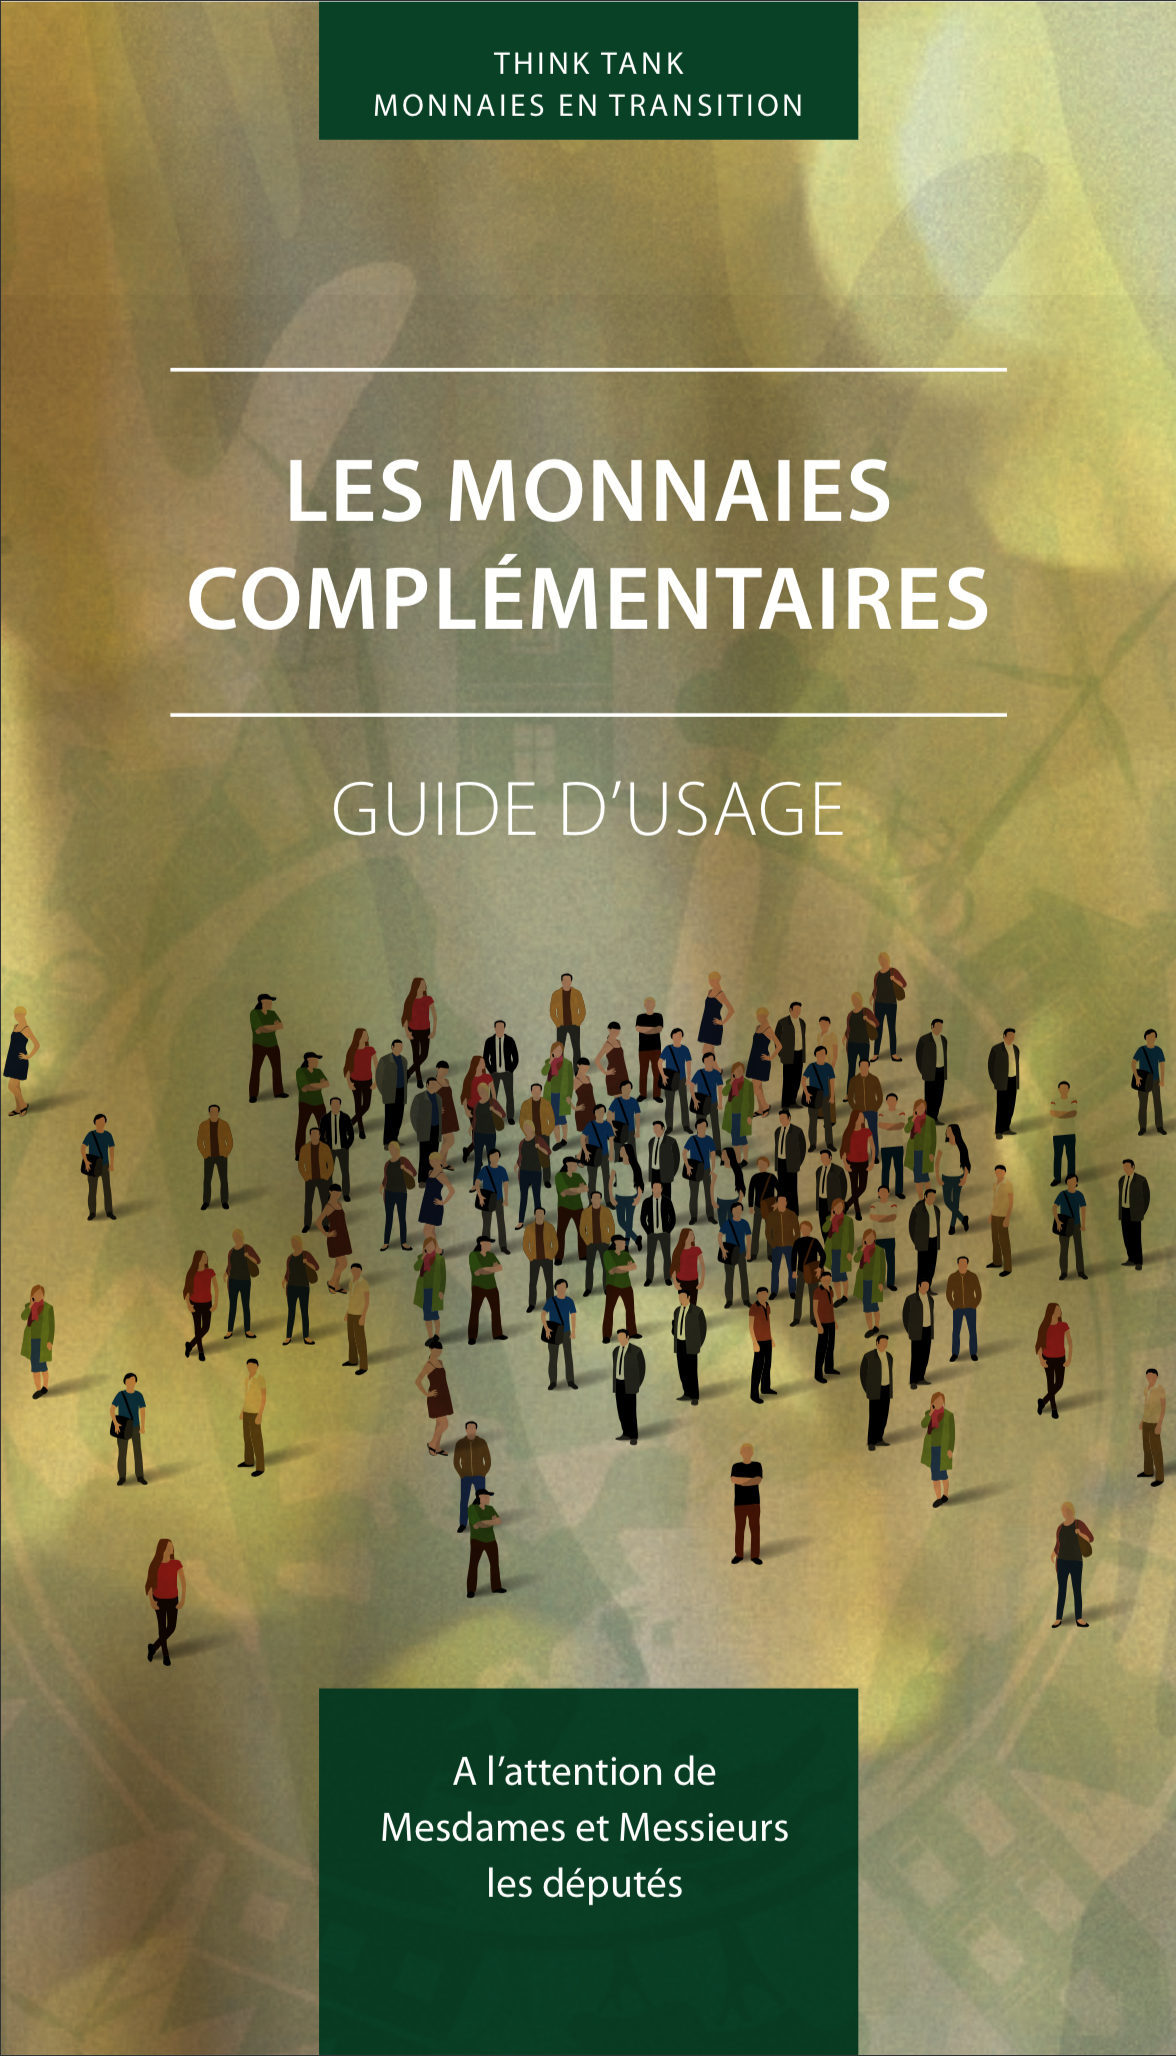 Guide_Monnaie_Complementaire_octobre_2017.png